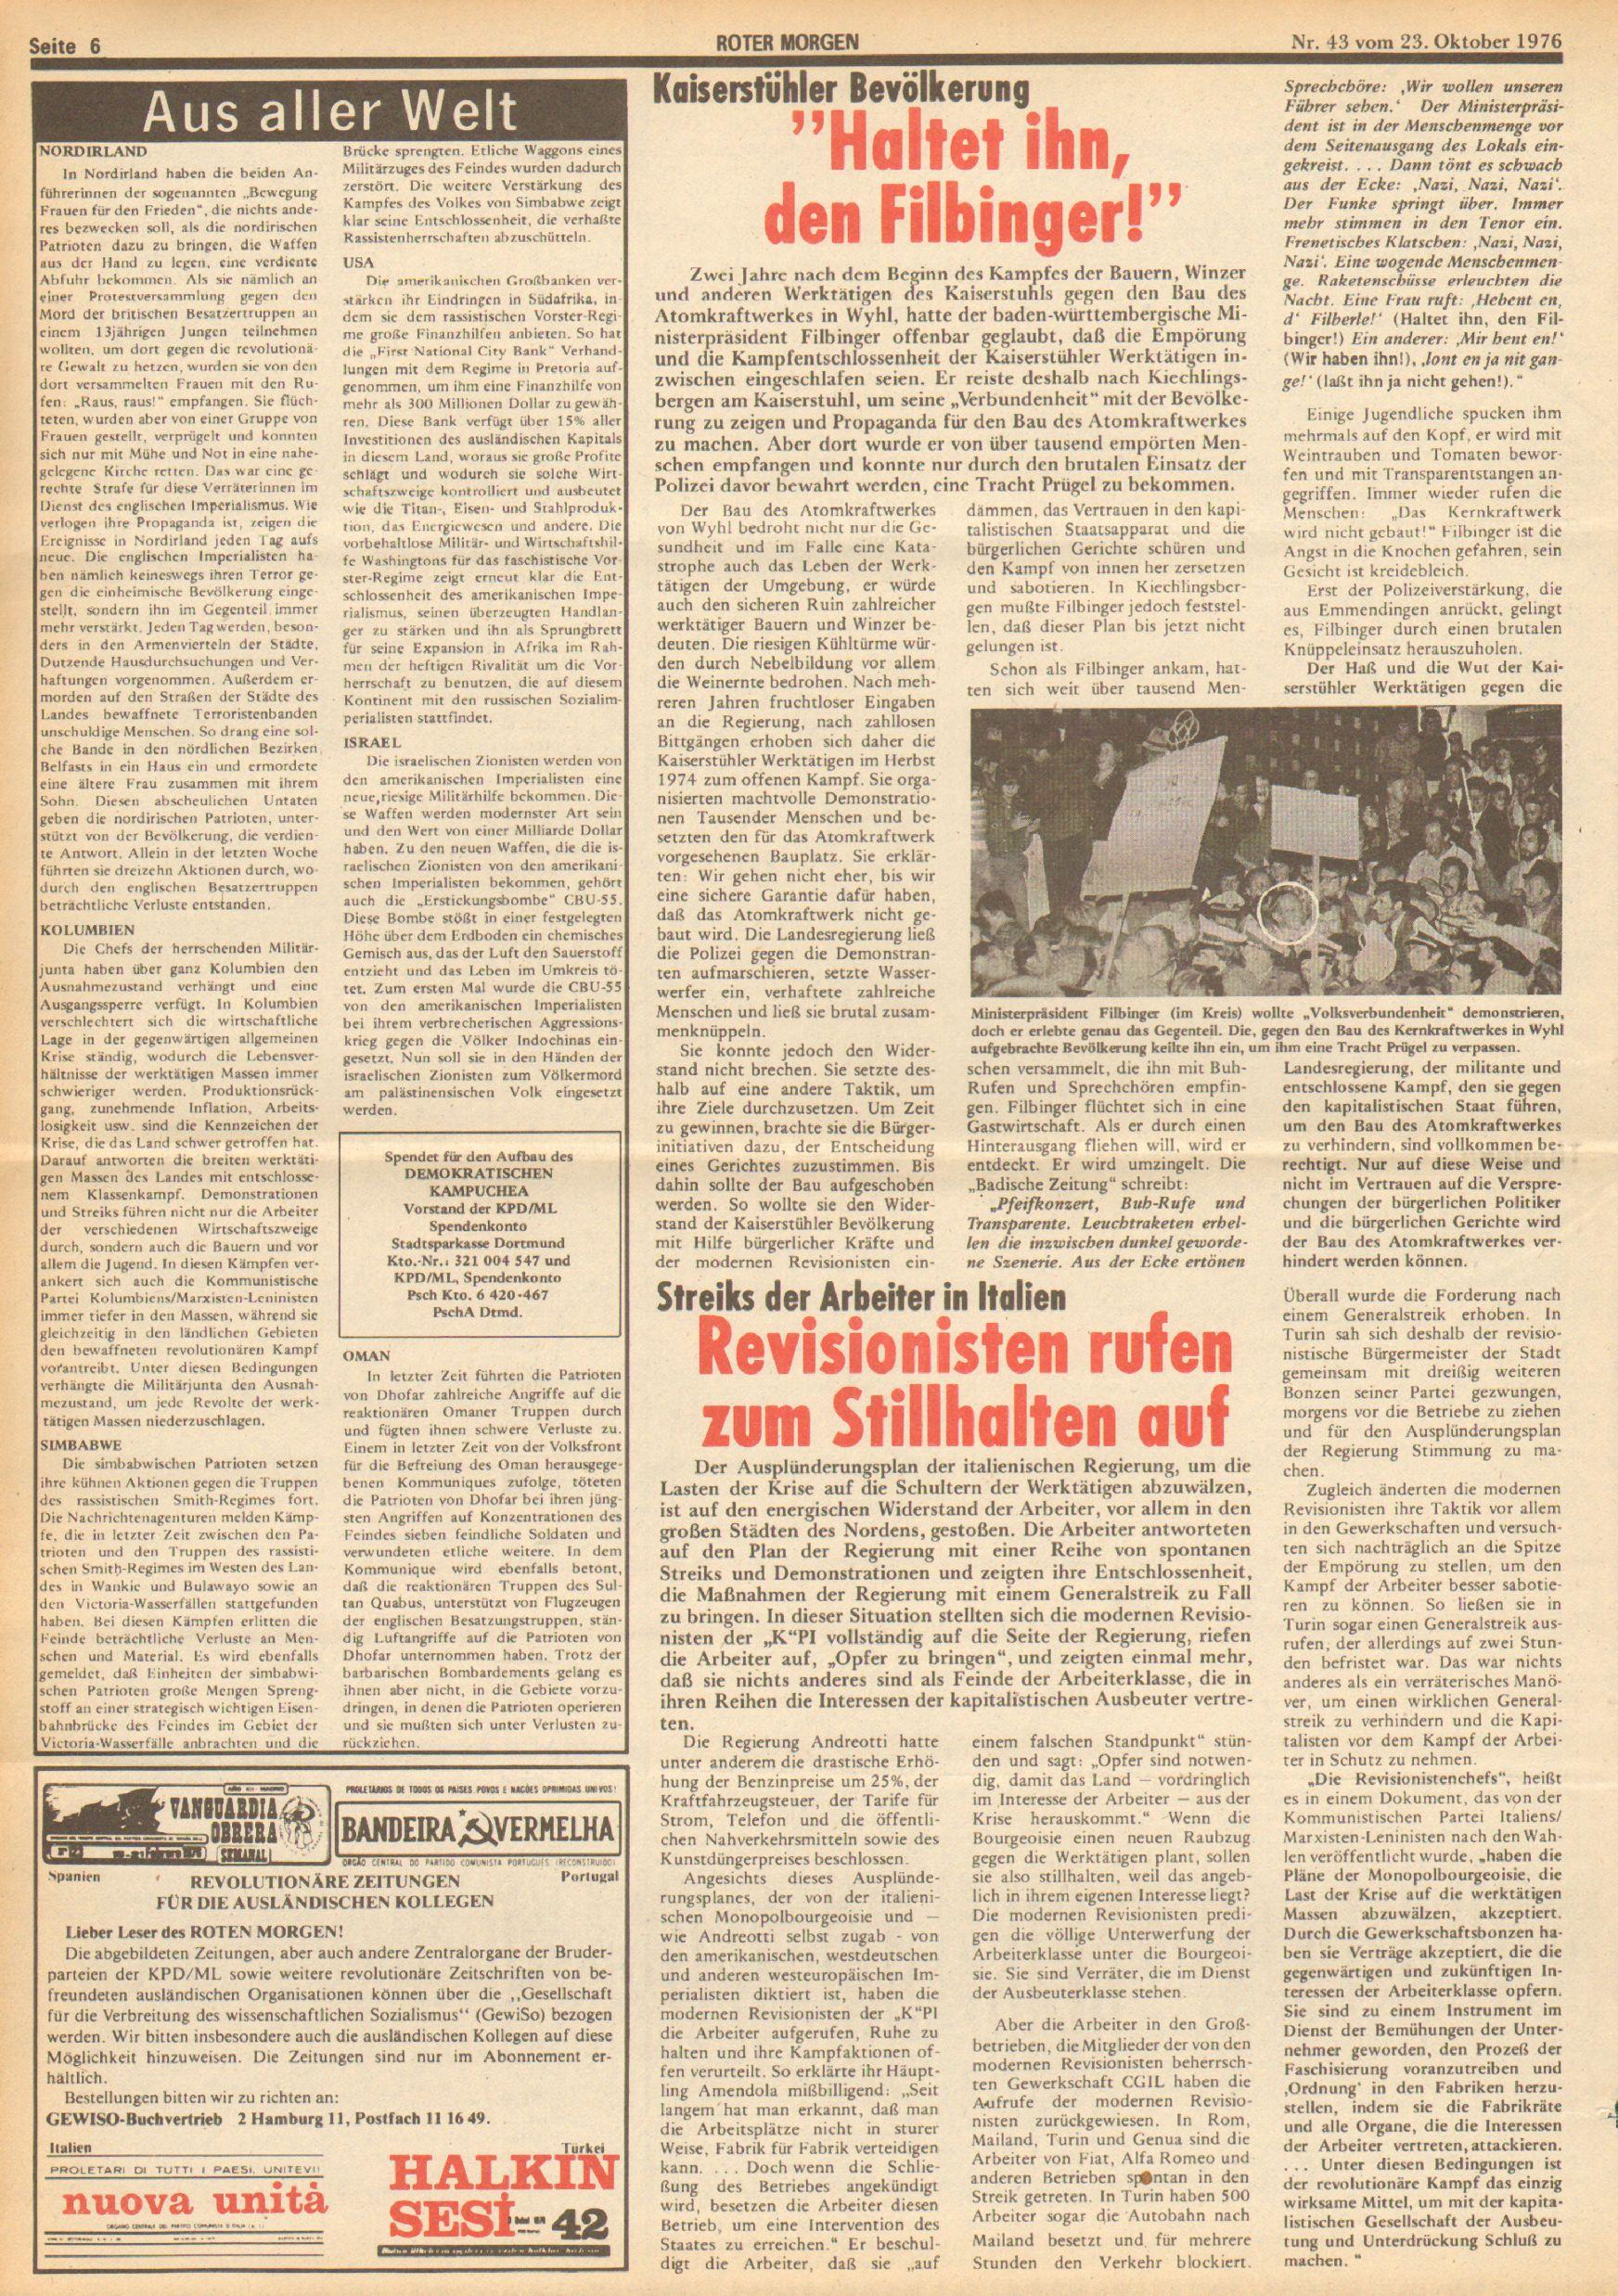 Roter Morgen, 10. Jg., 23. Oktober 1976, Nr. 43, Seite 6